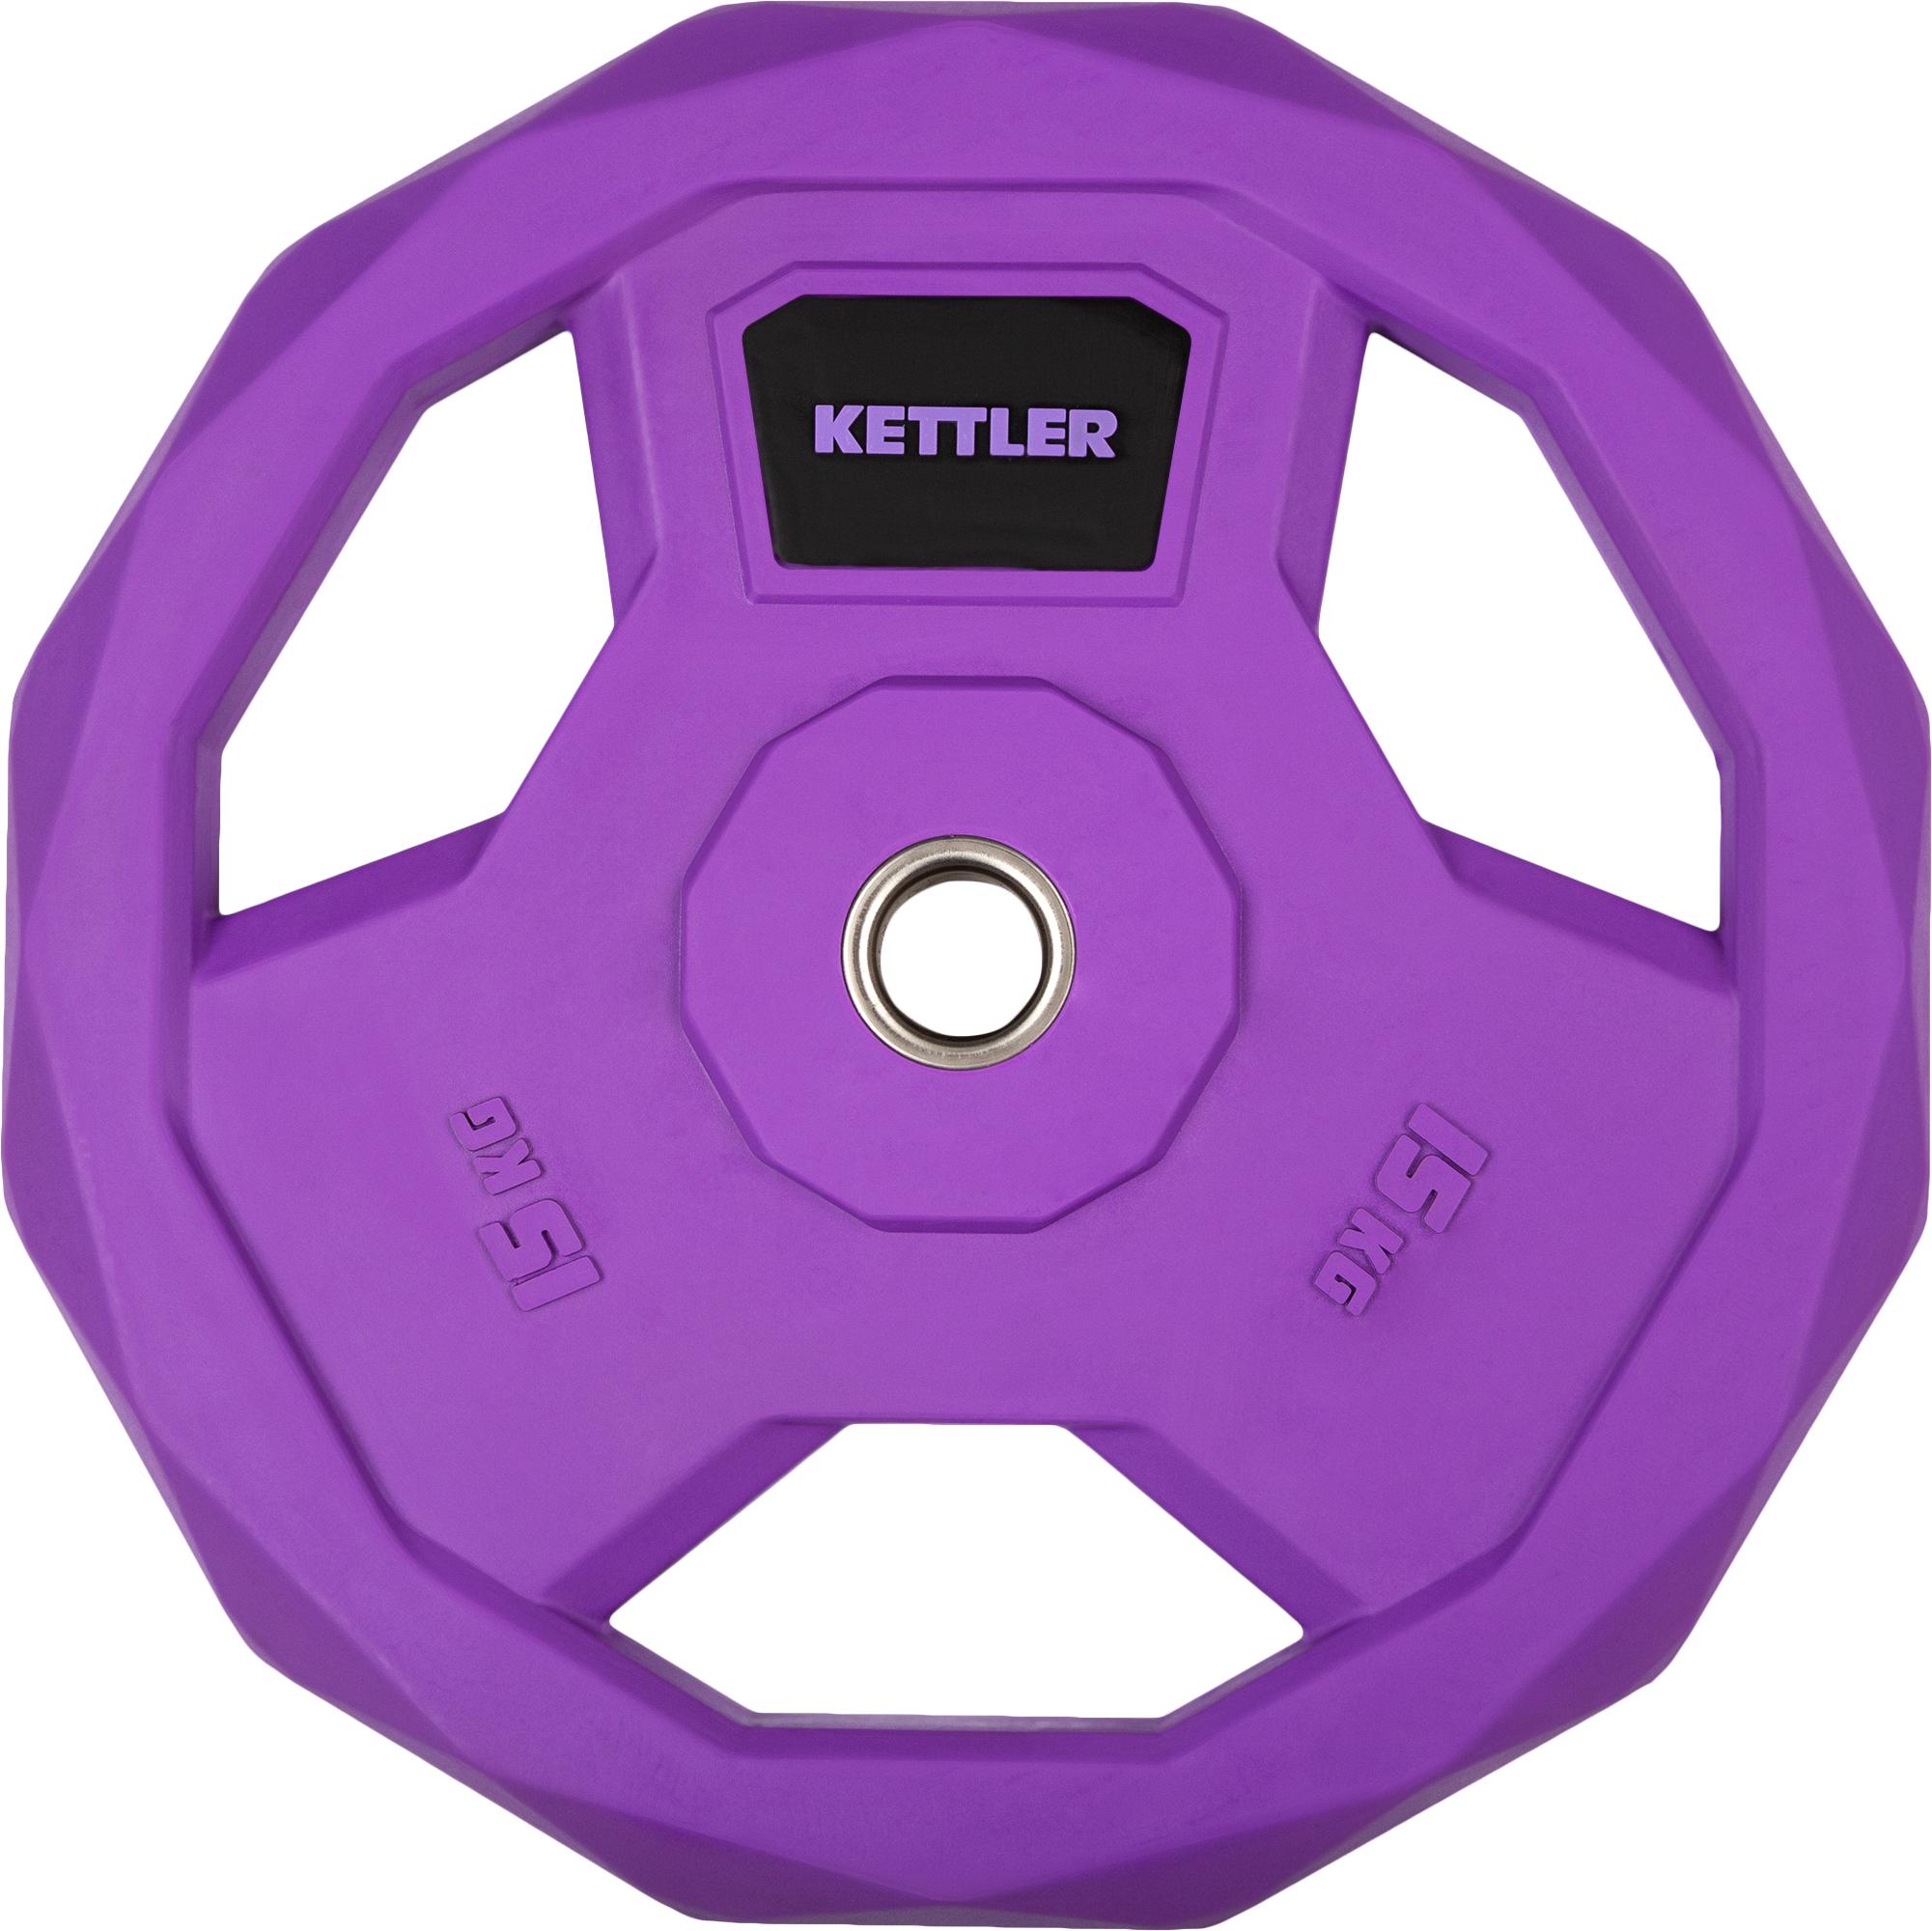 Kettler Блин стальной обрезиненный Kettler 15 кг